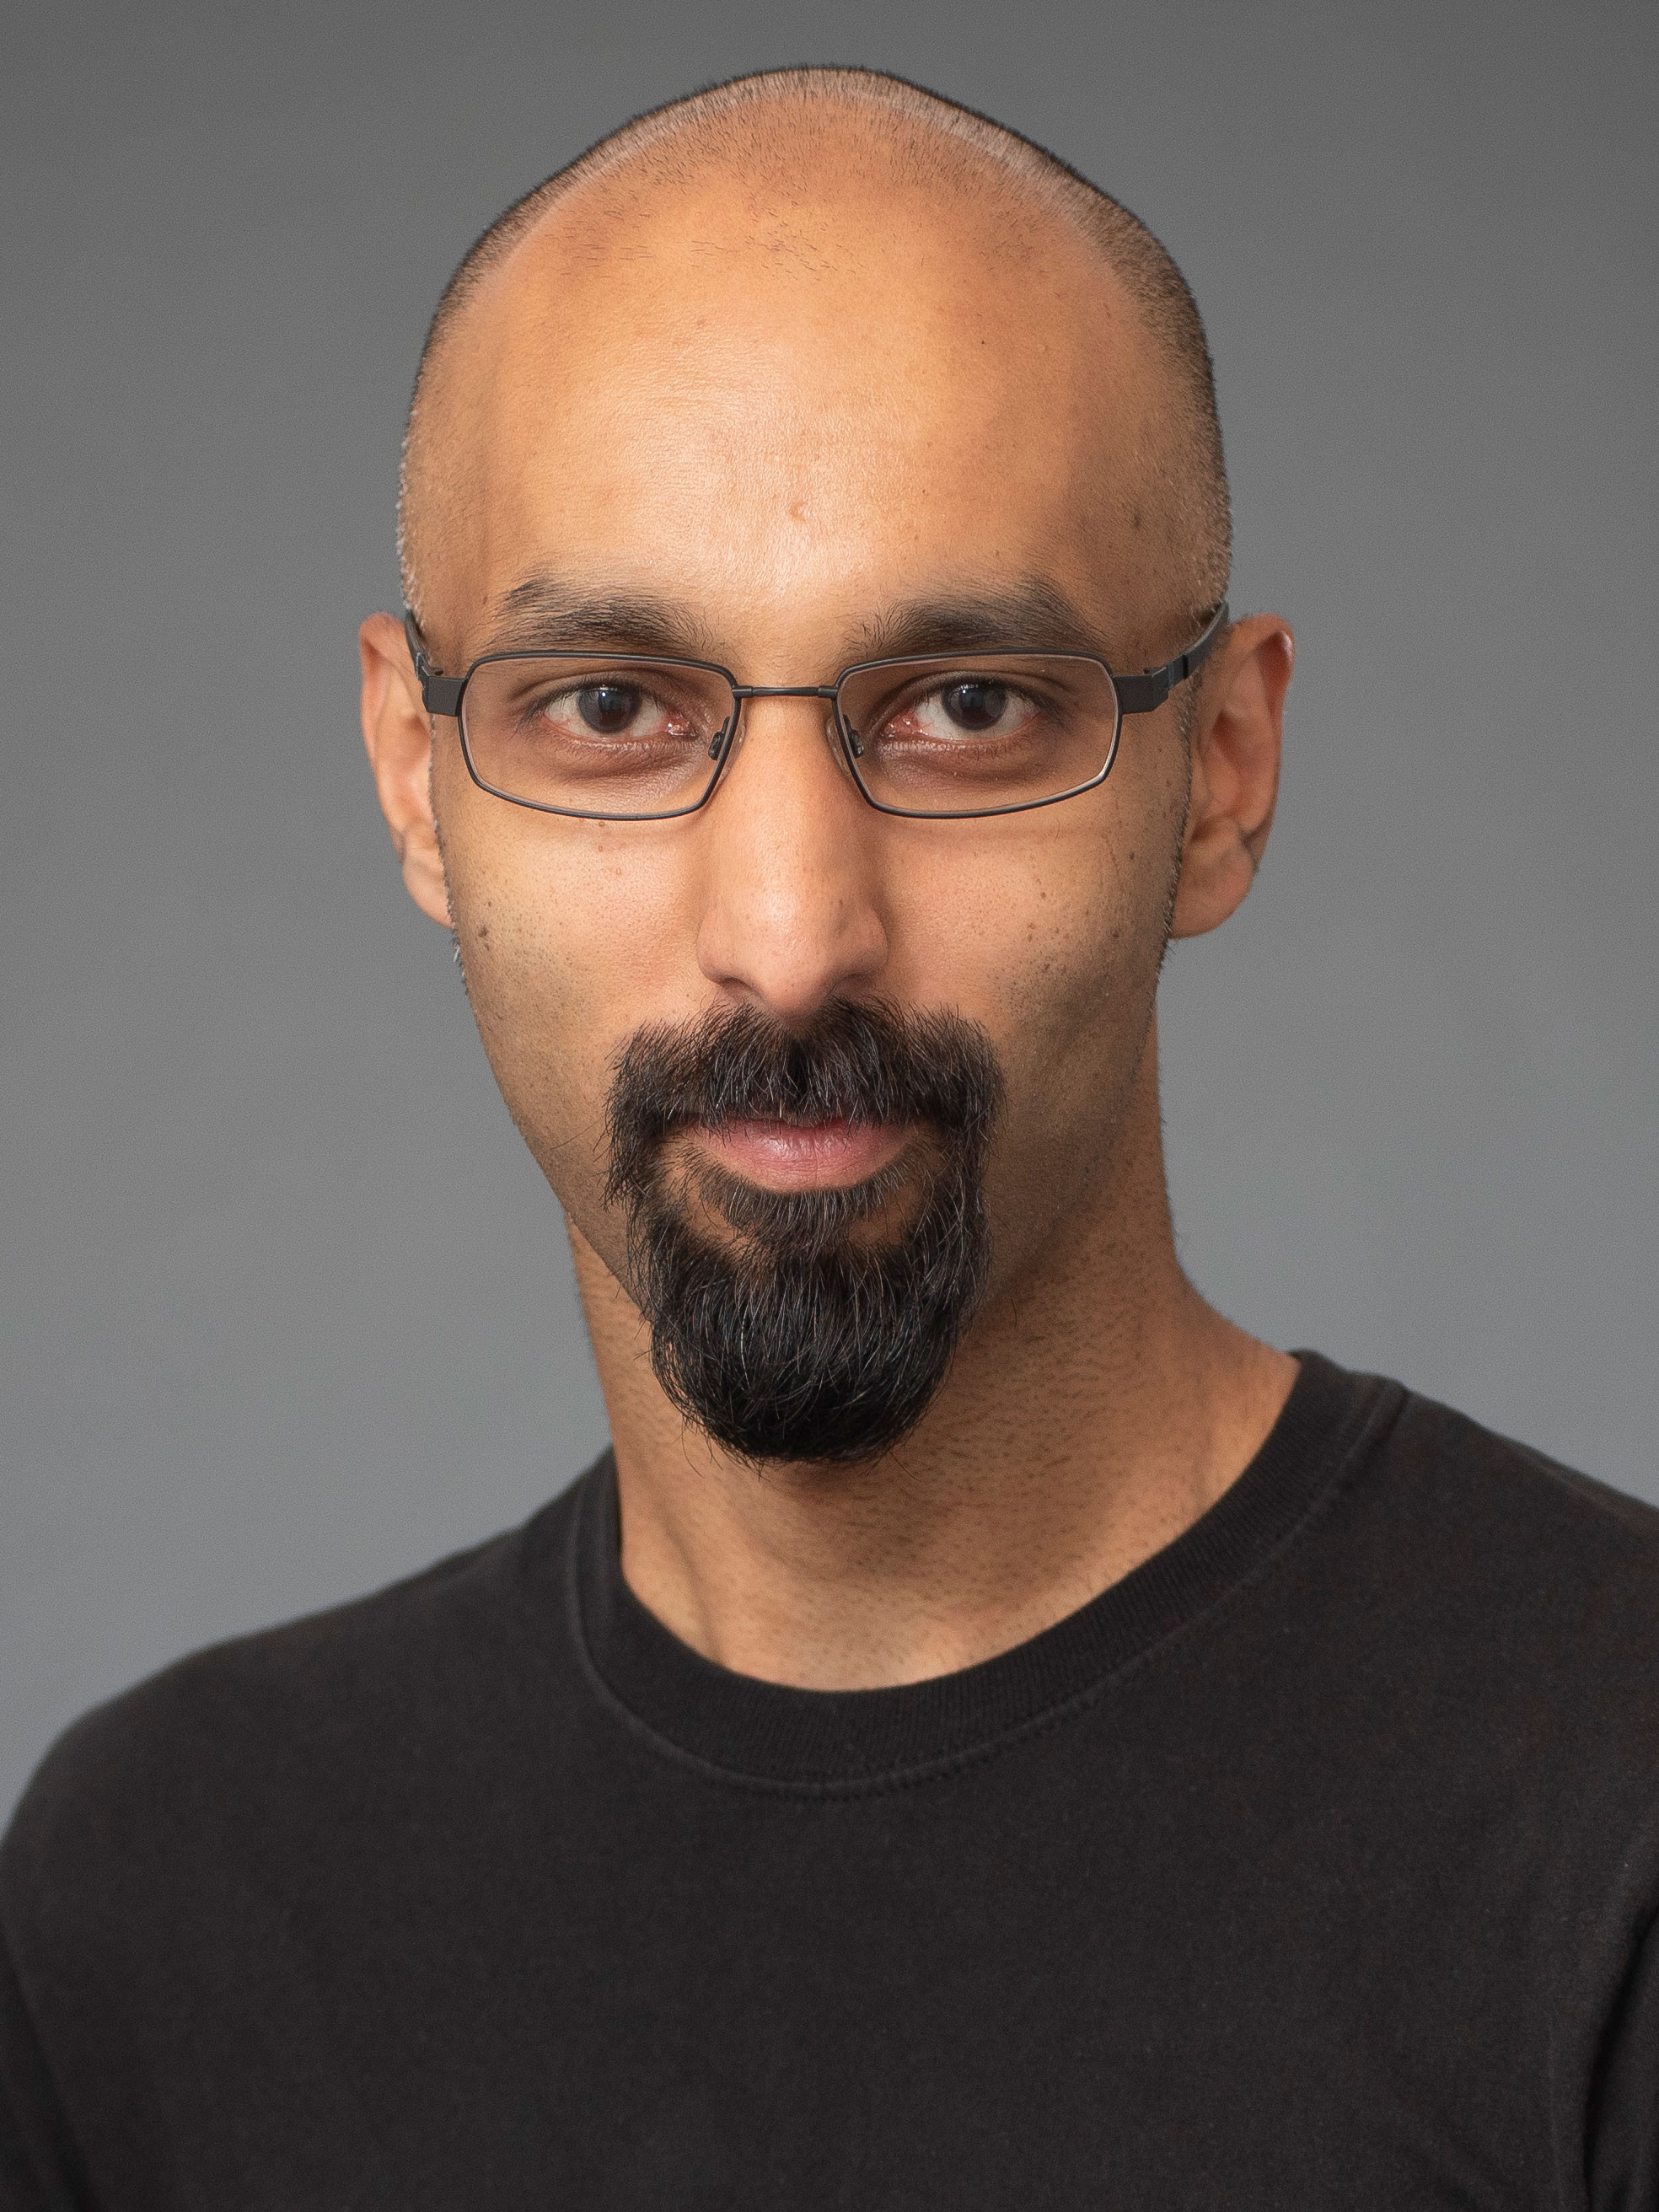 Mohammad Abbas Yaseen